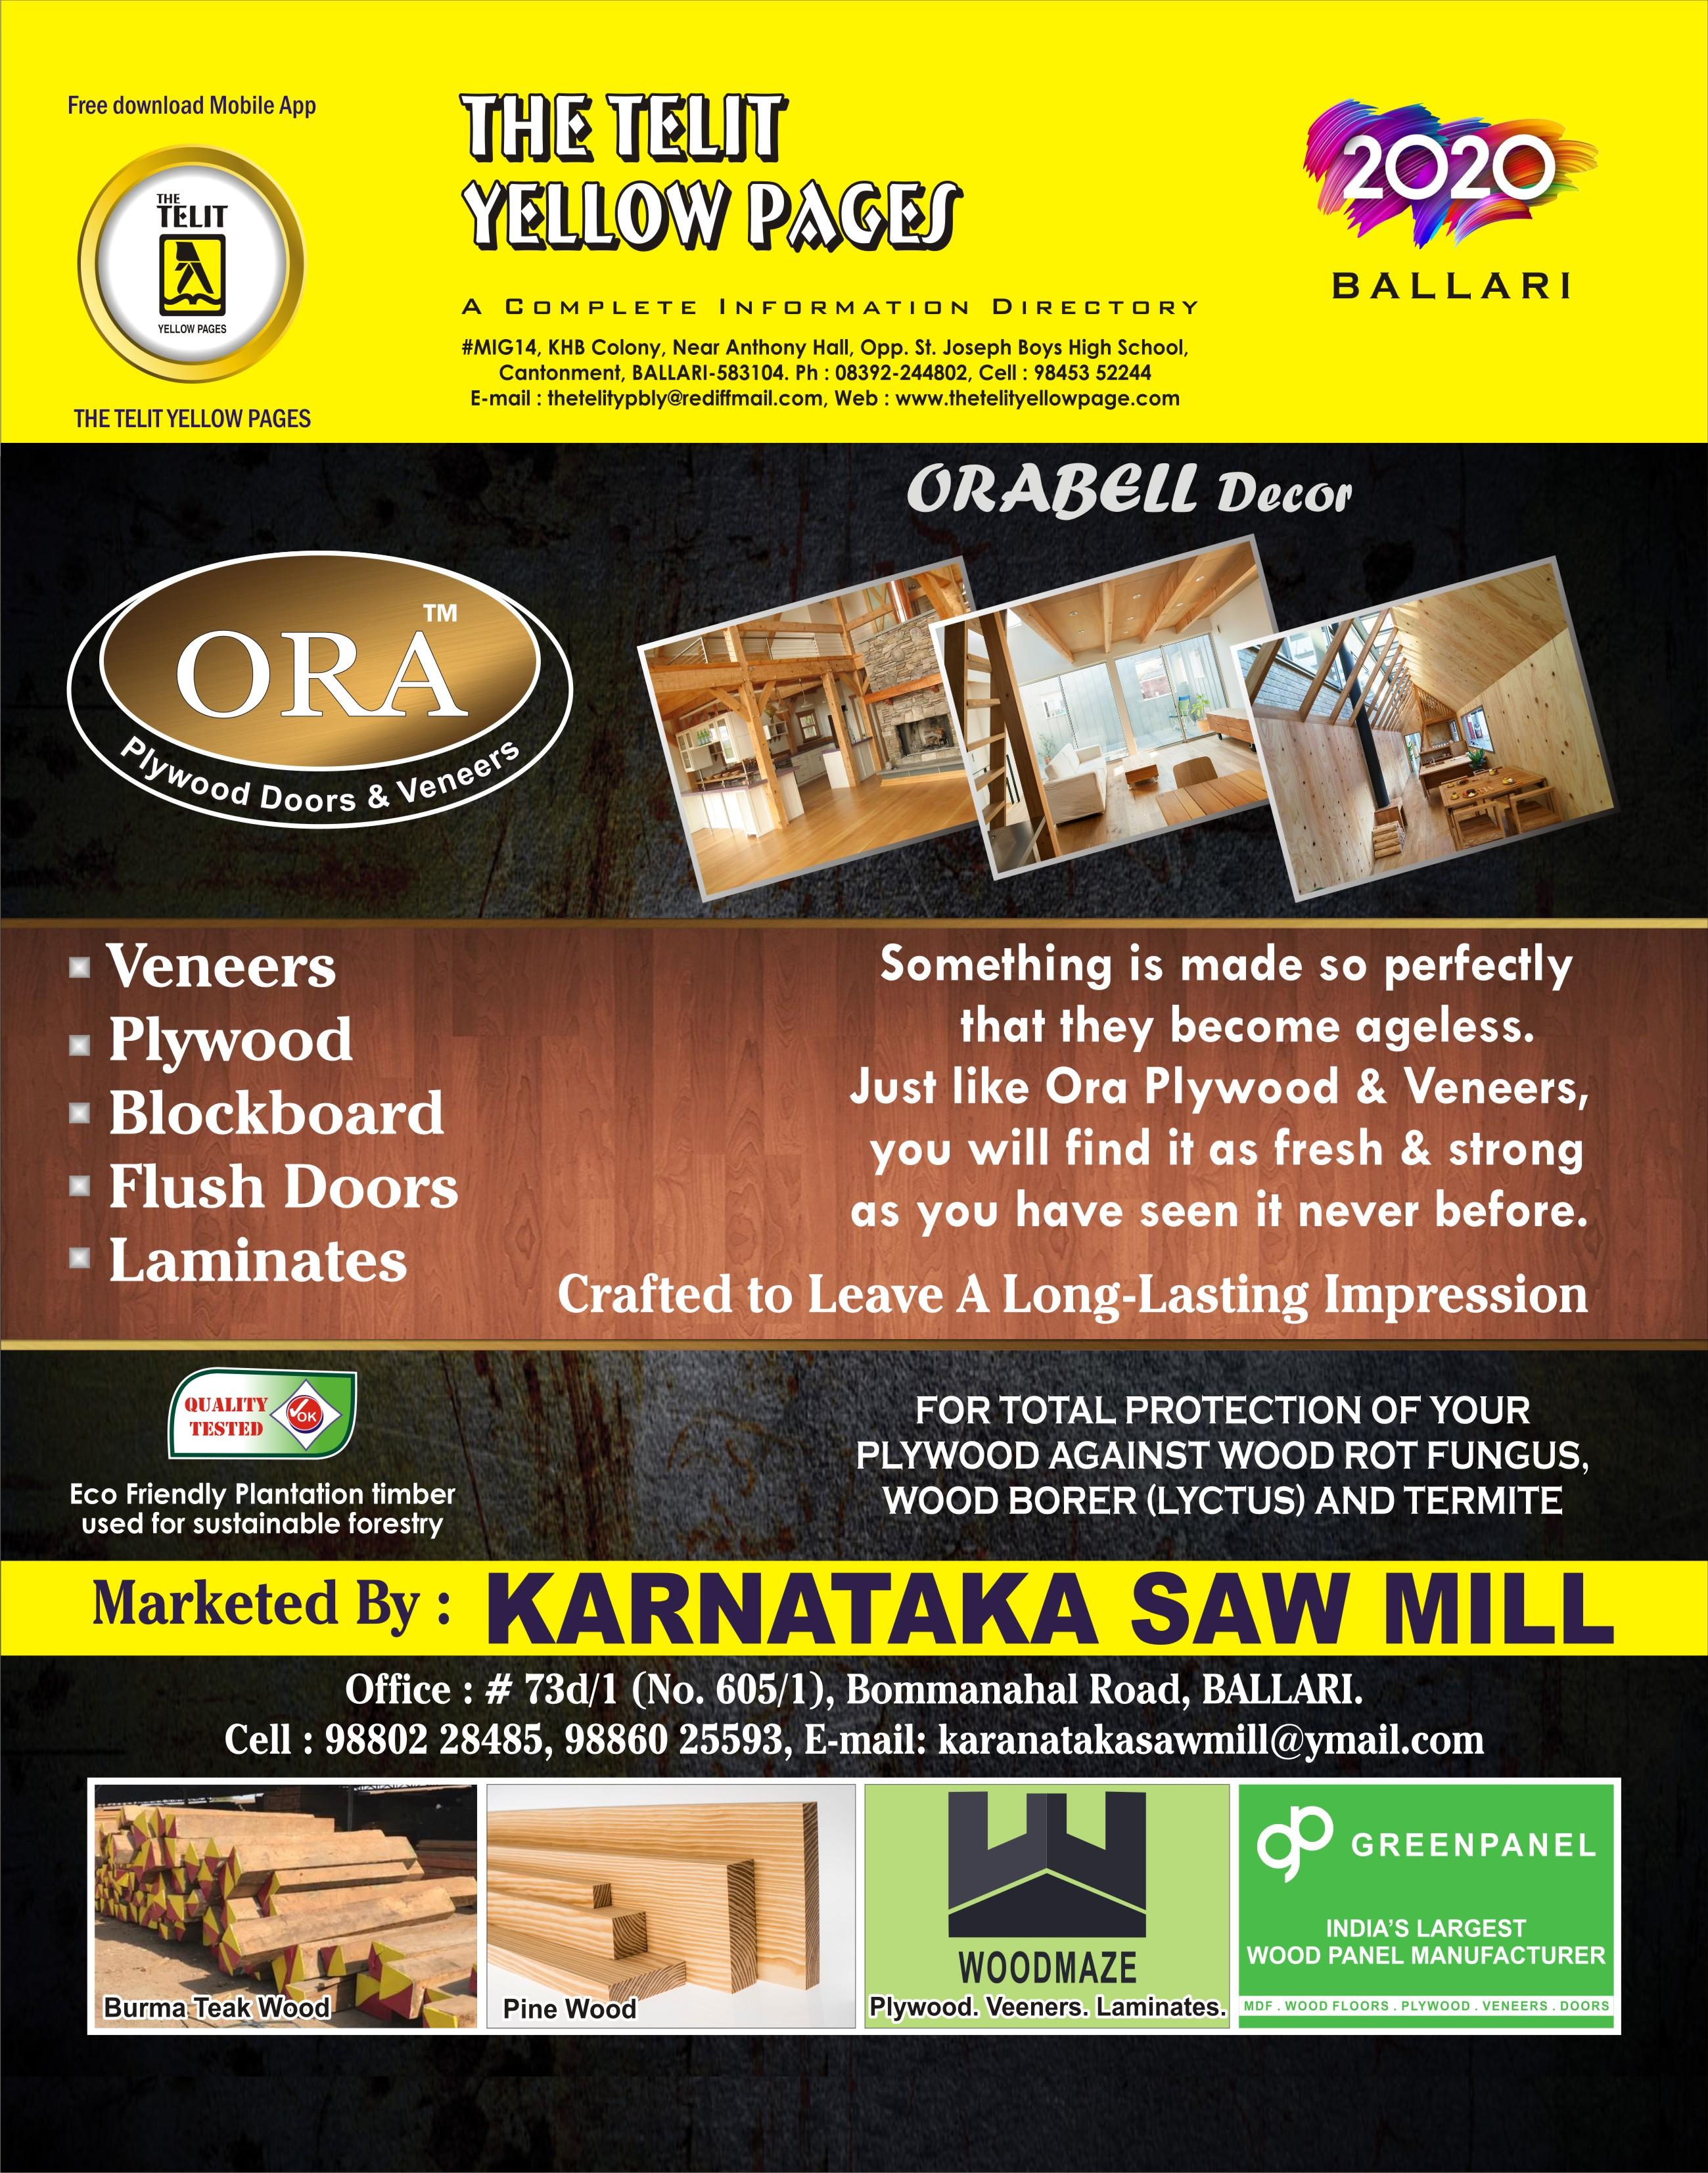 Plywood Suppliers in Ballari